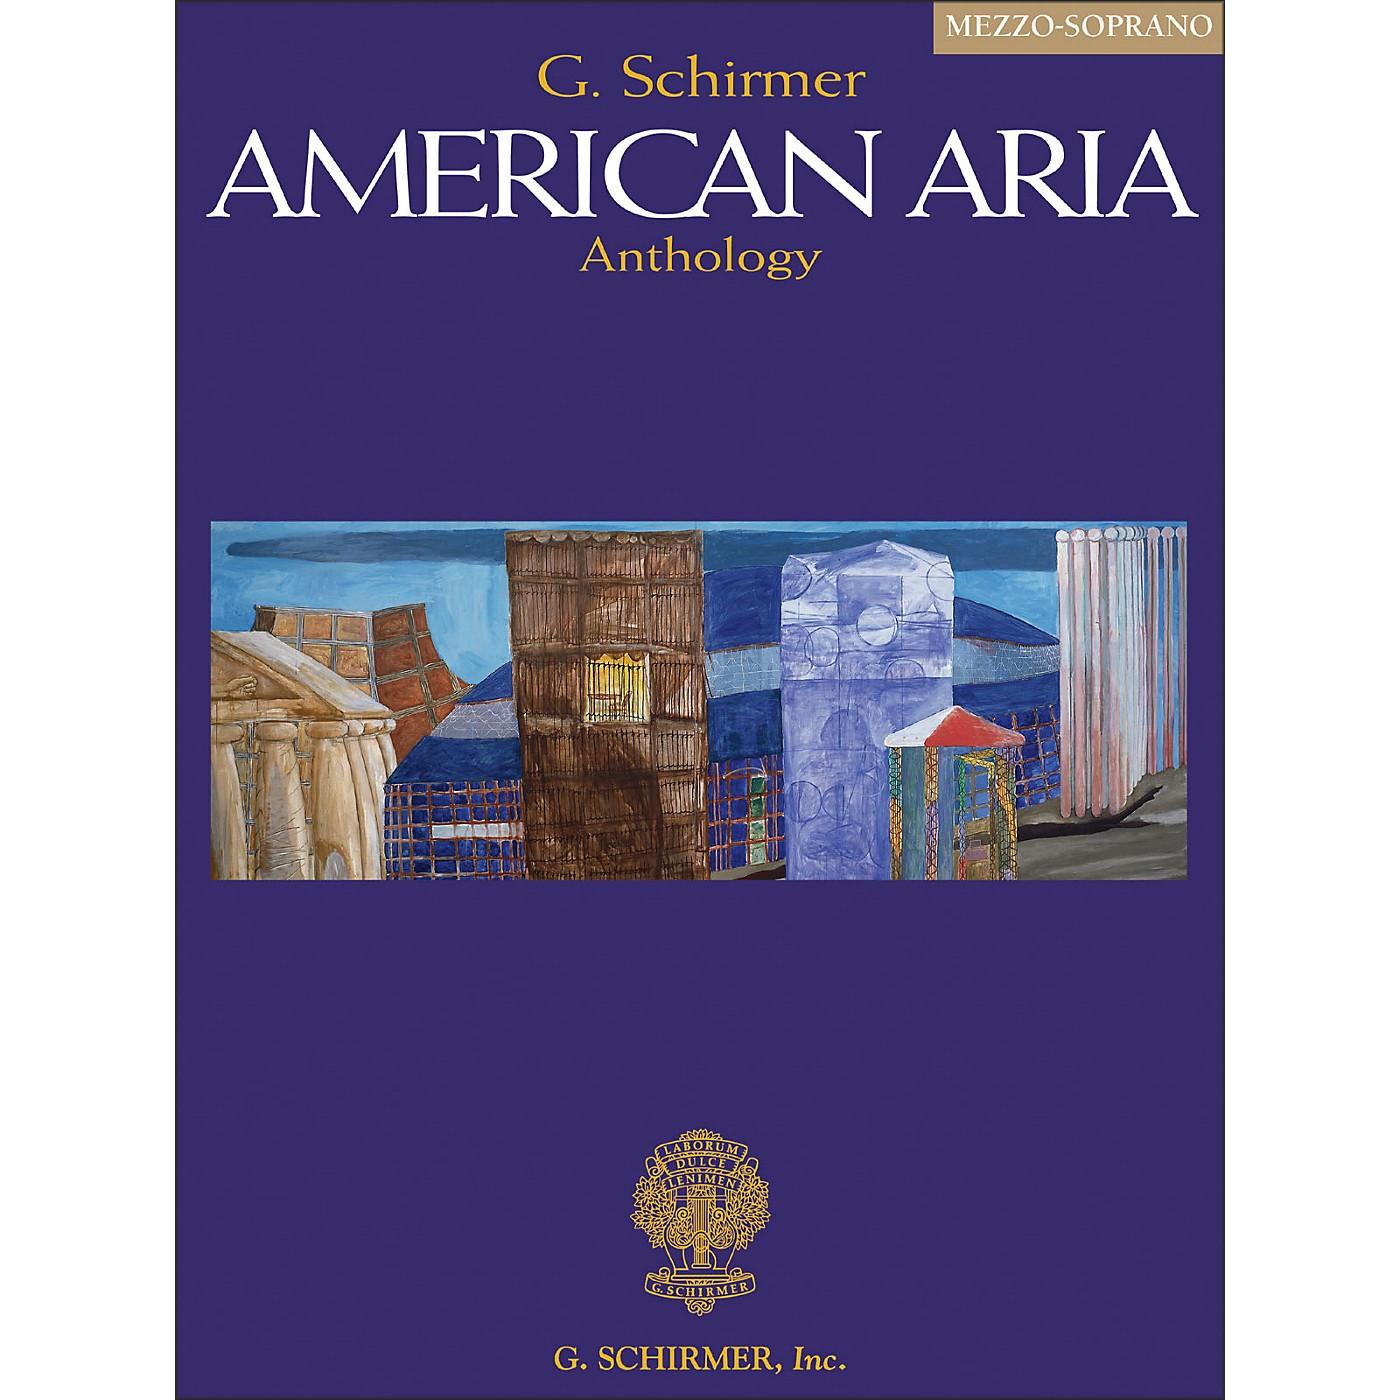 G. Schirmer G. Schirmer American Aria Anthology for Mezzo-Soprano Voice thumbnail